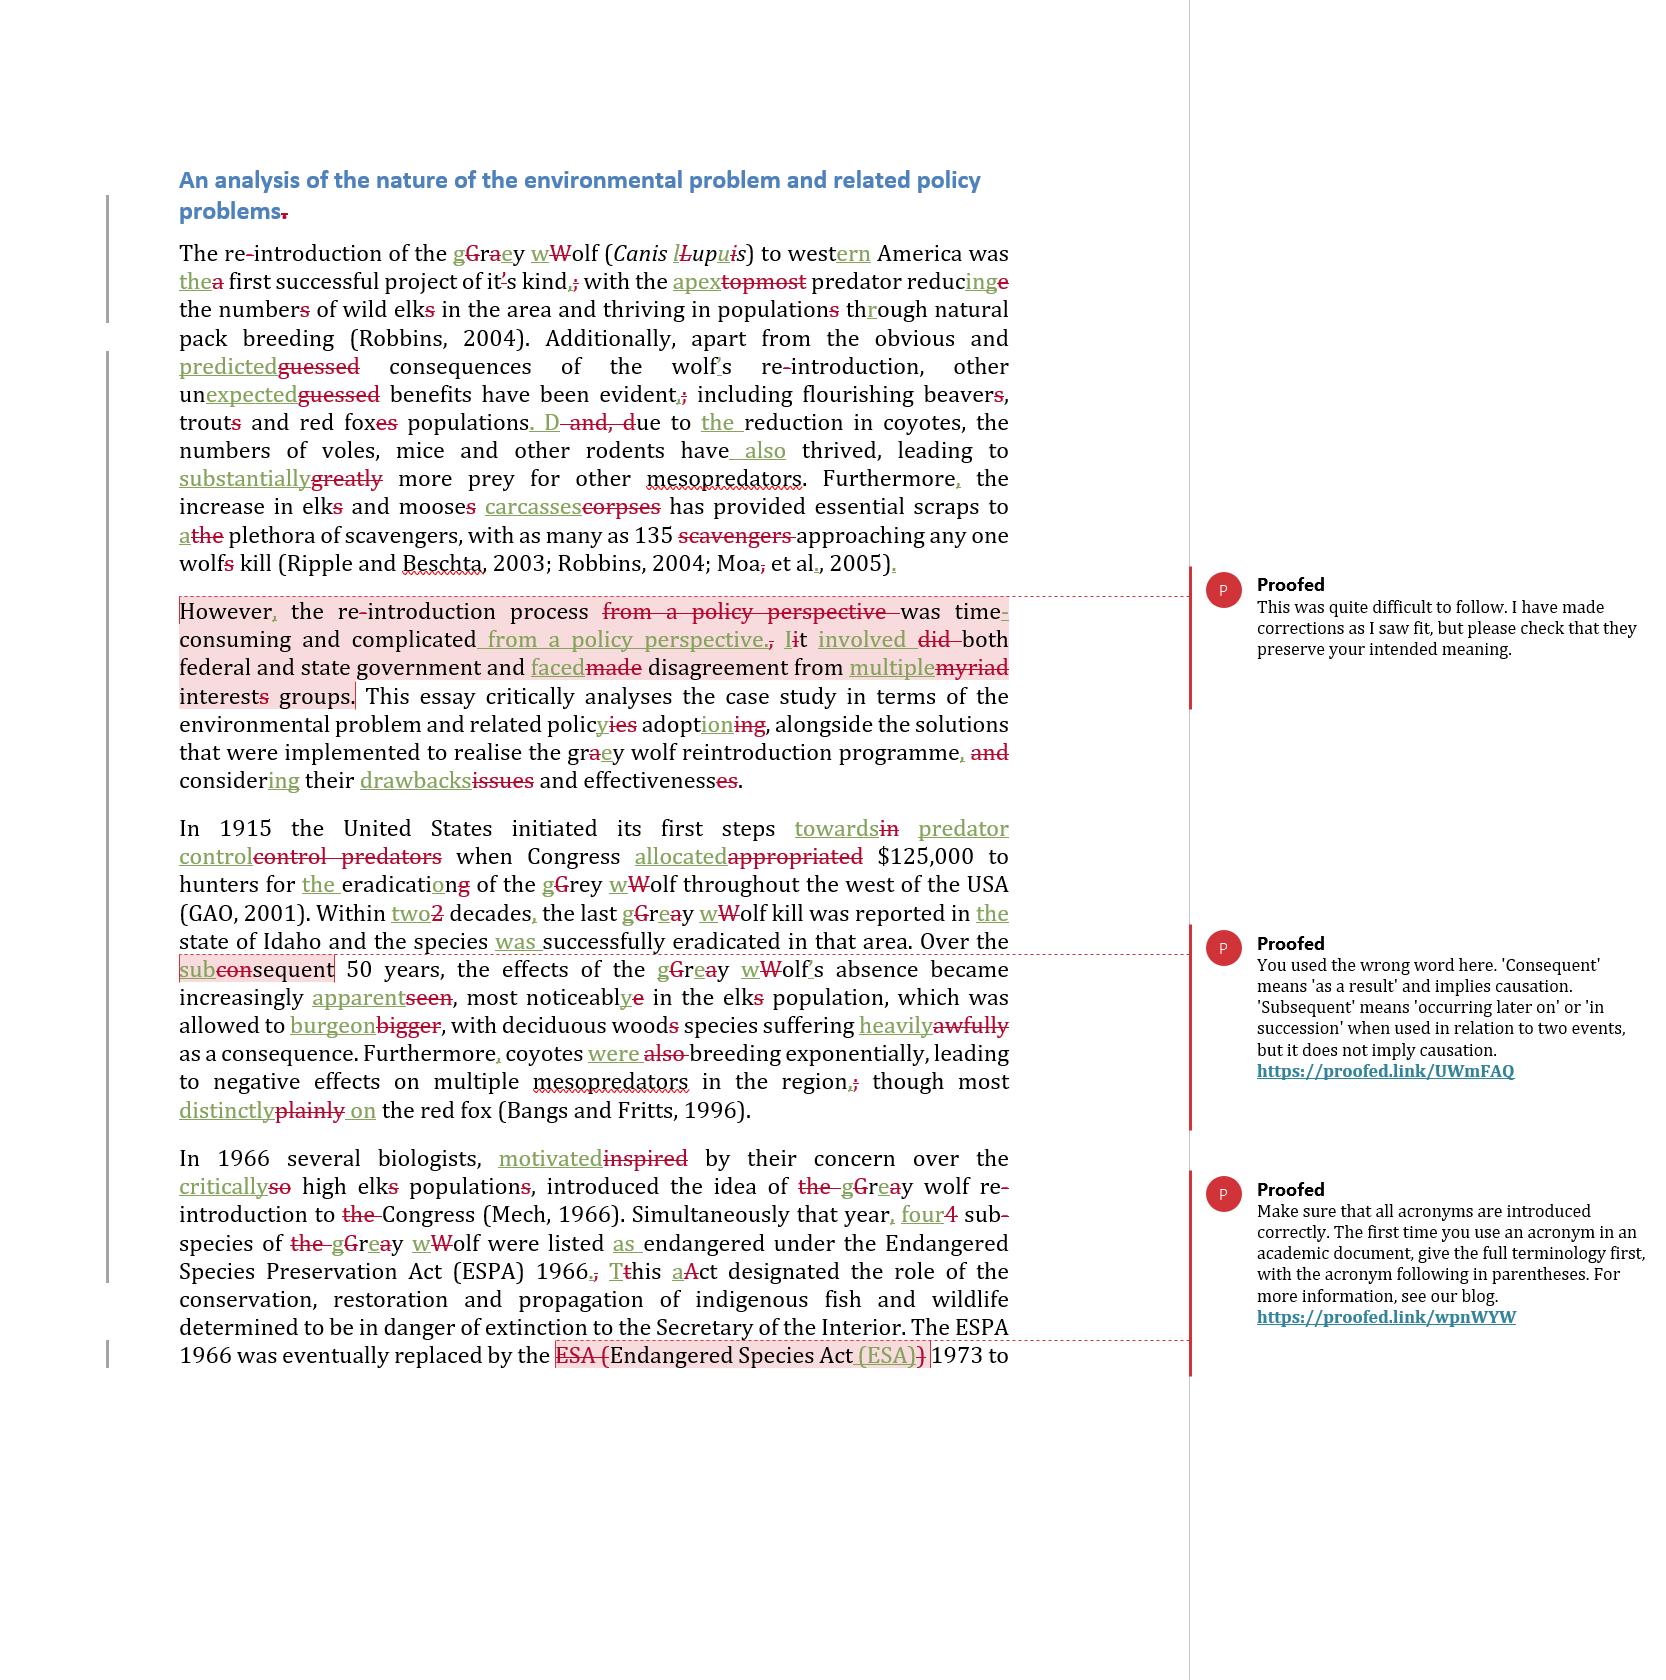 Persuasive essay proofreading site au writing service yahoo